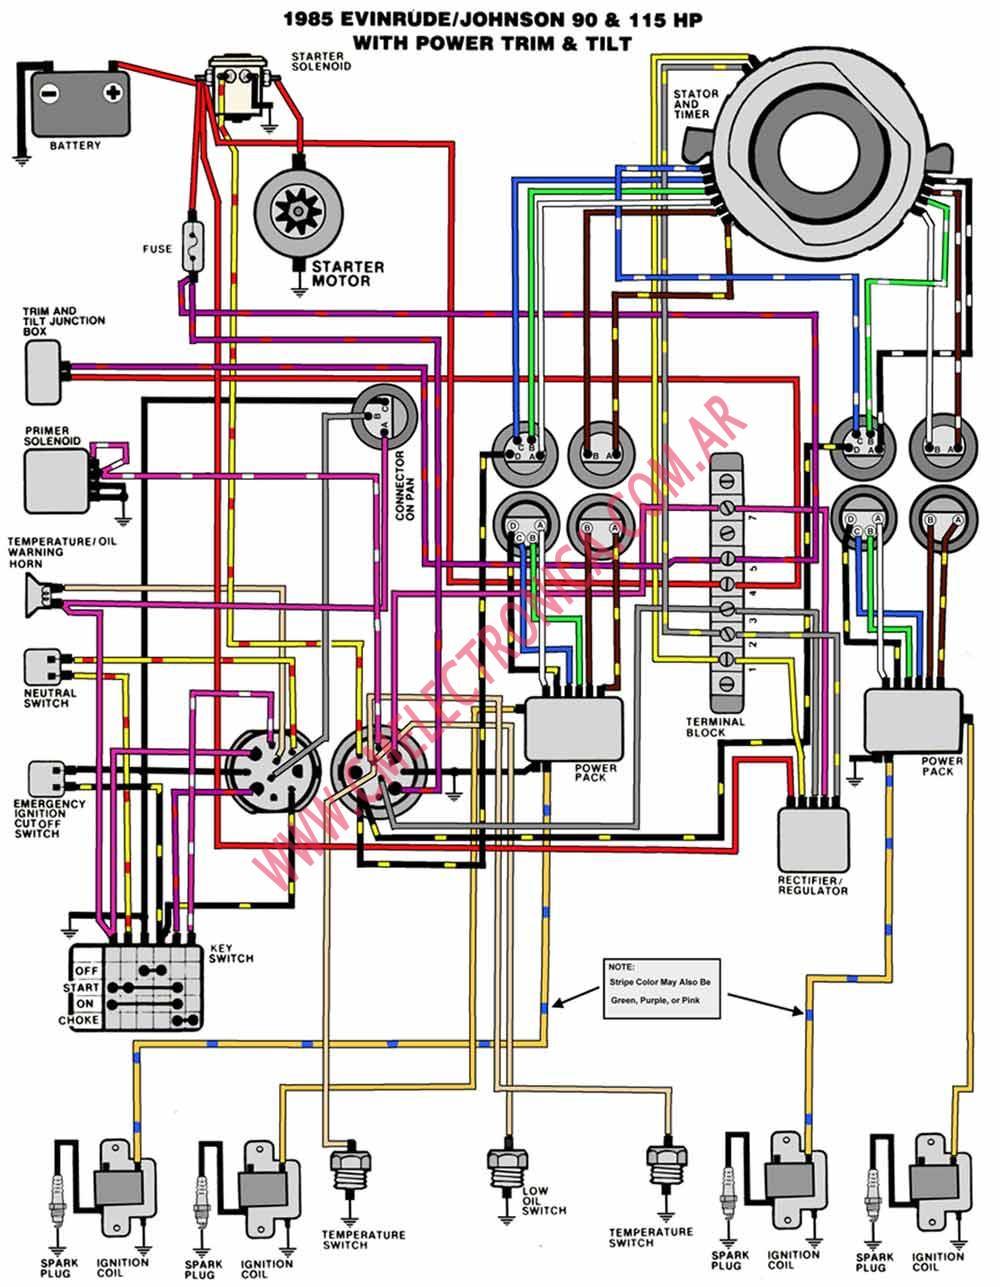 Dodge 5500 Truck Refuse Western Plow Wiring Diagram Wiring Diagram Air